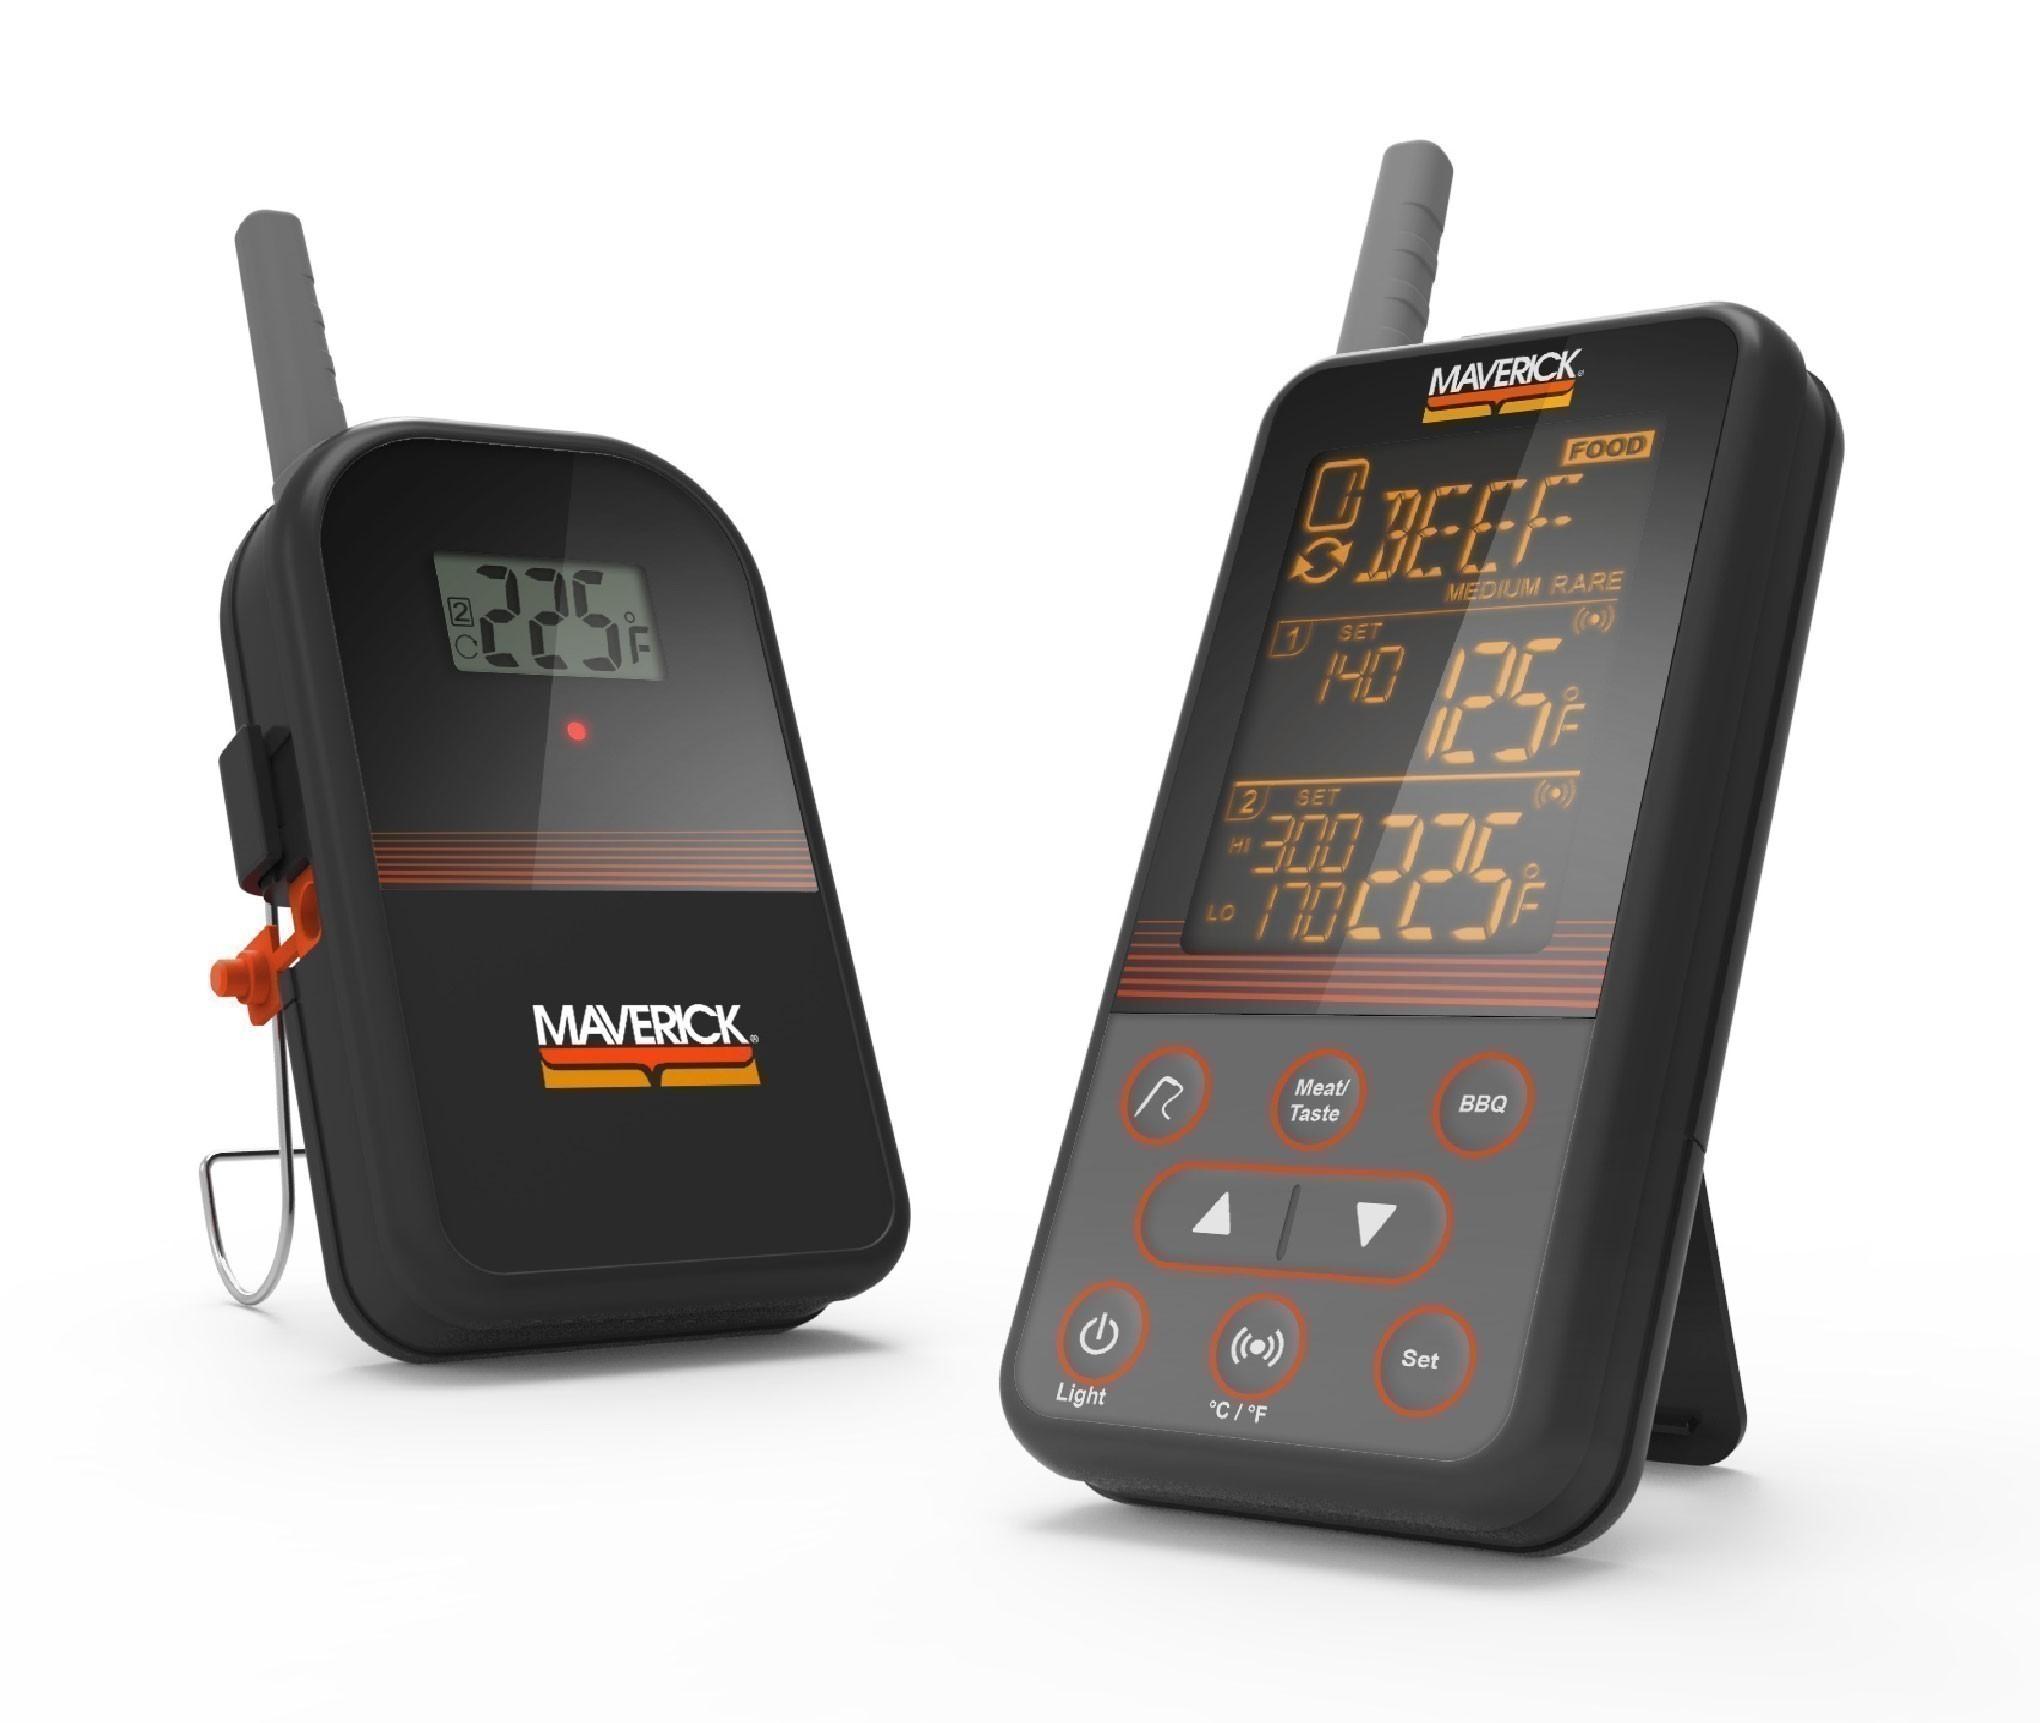 Maverick XR-40 Funkthermometer Extended Range Wireless BBQ & Meat Bild 1